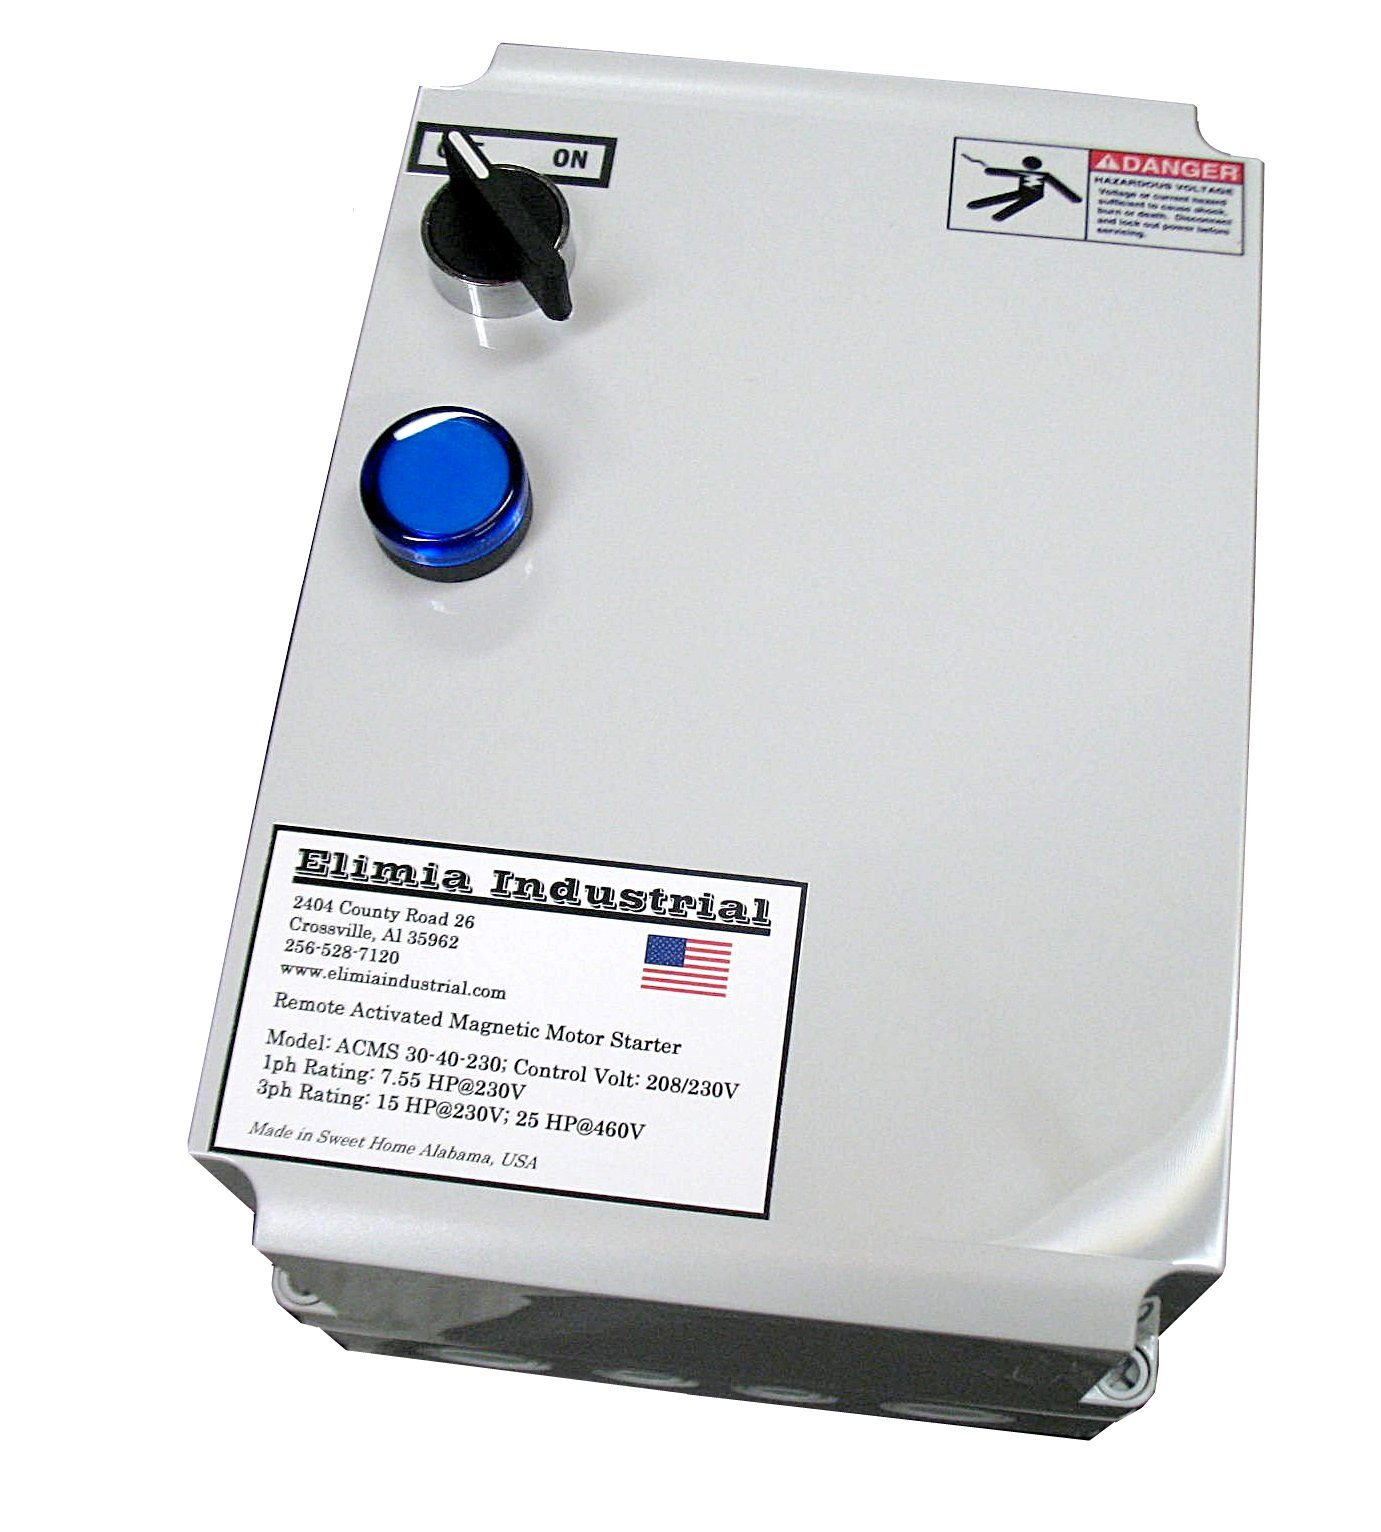 Elimia Air Compressor Motor Starter, 15 HP, 230V, Nema 4X, 37-50 Amp Overload, Made in USA